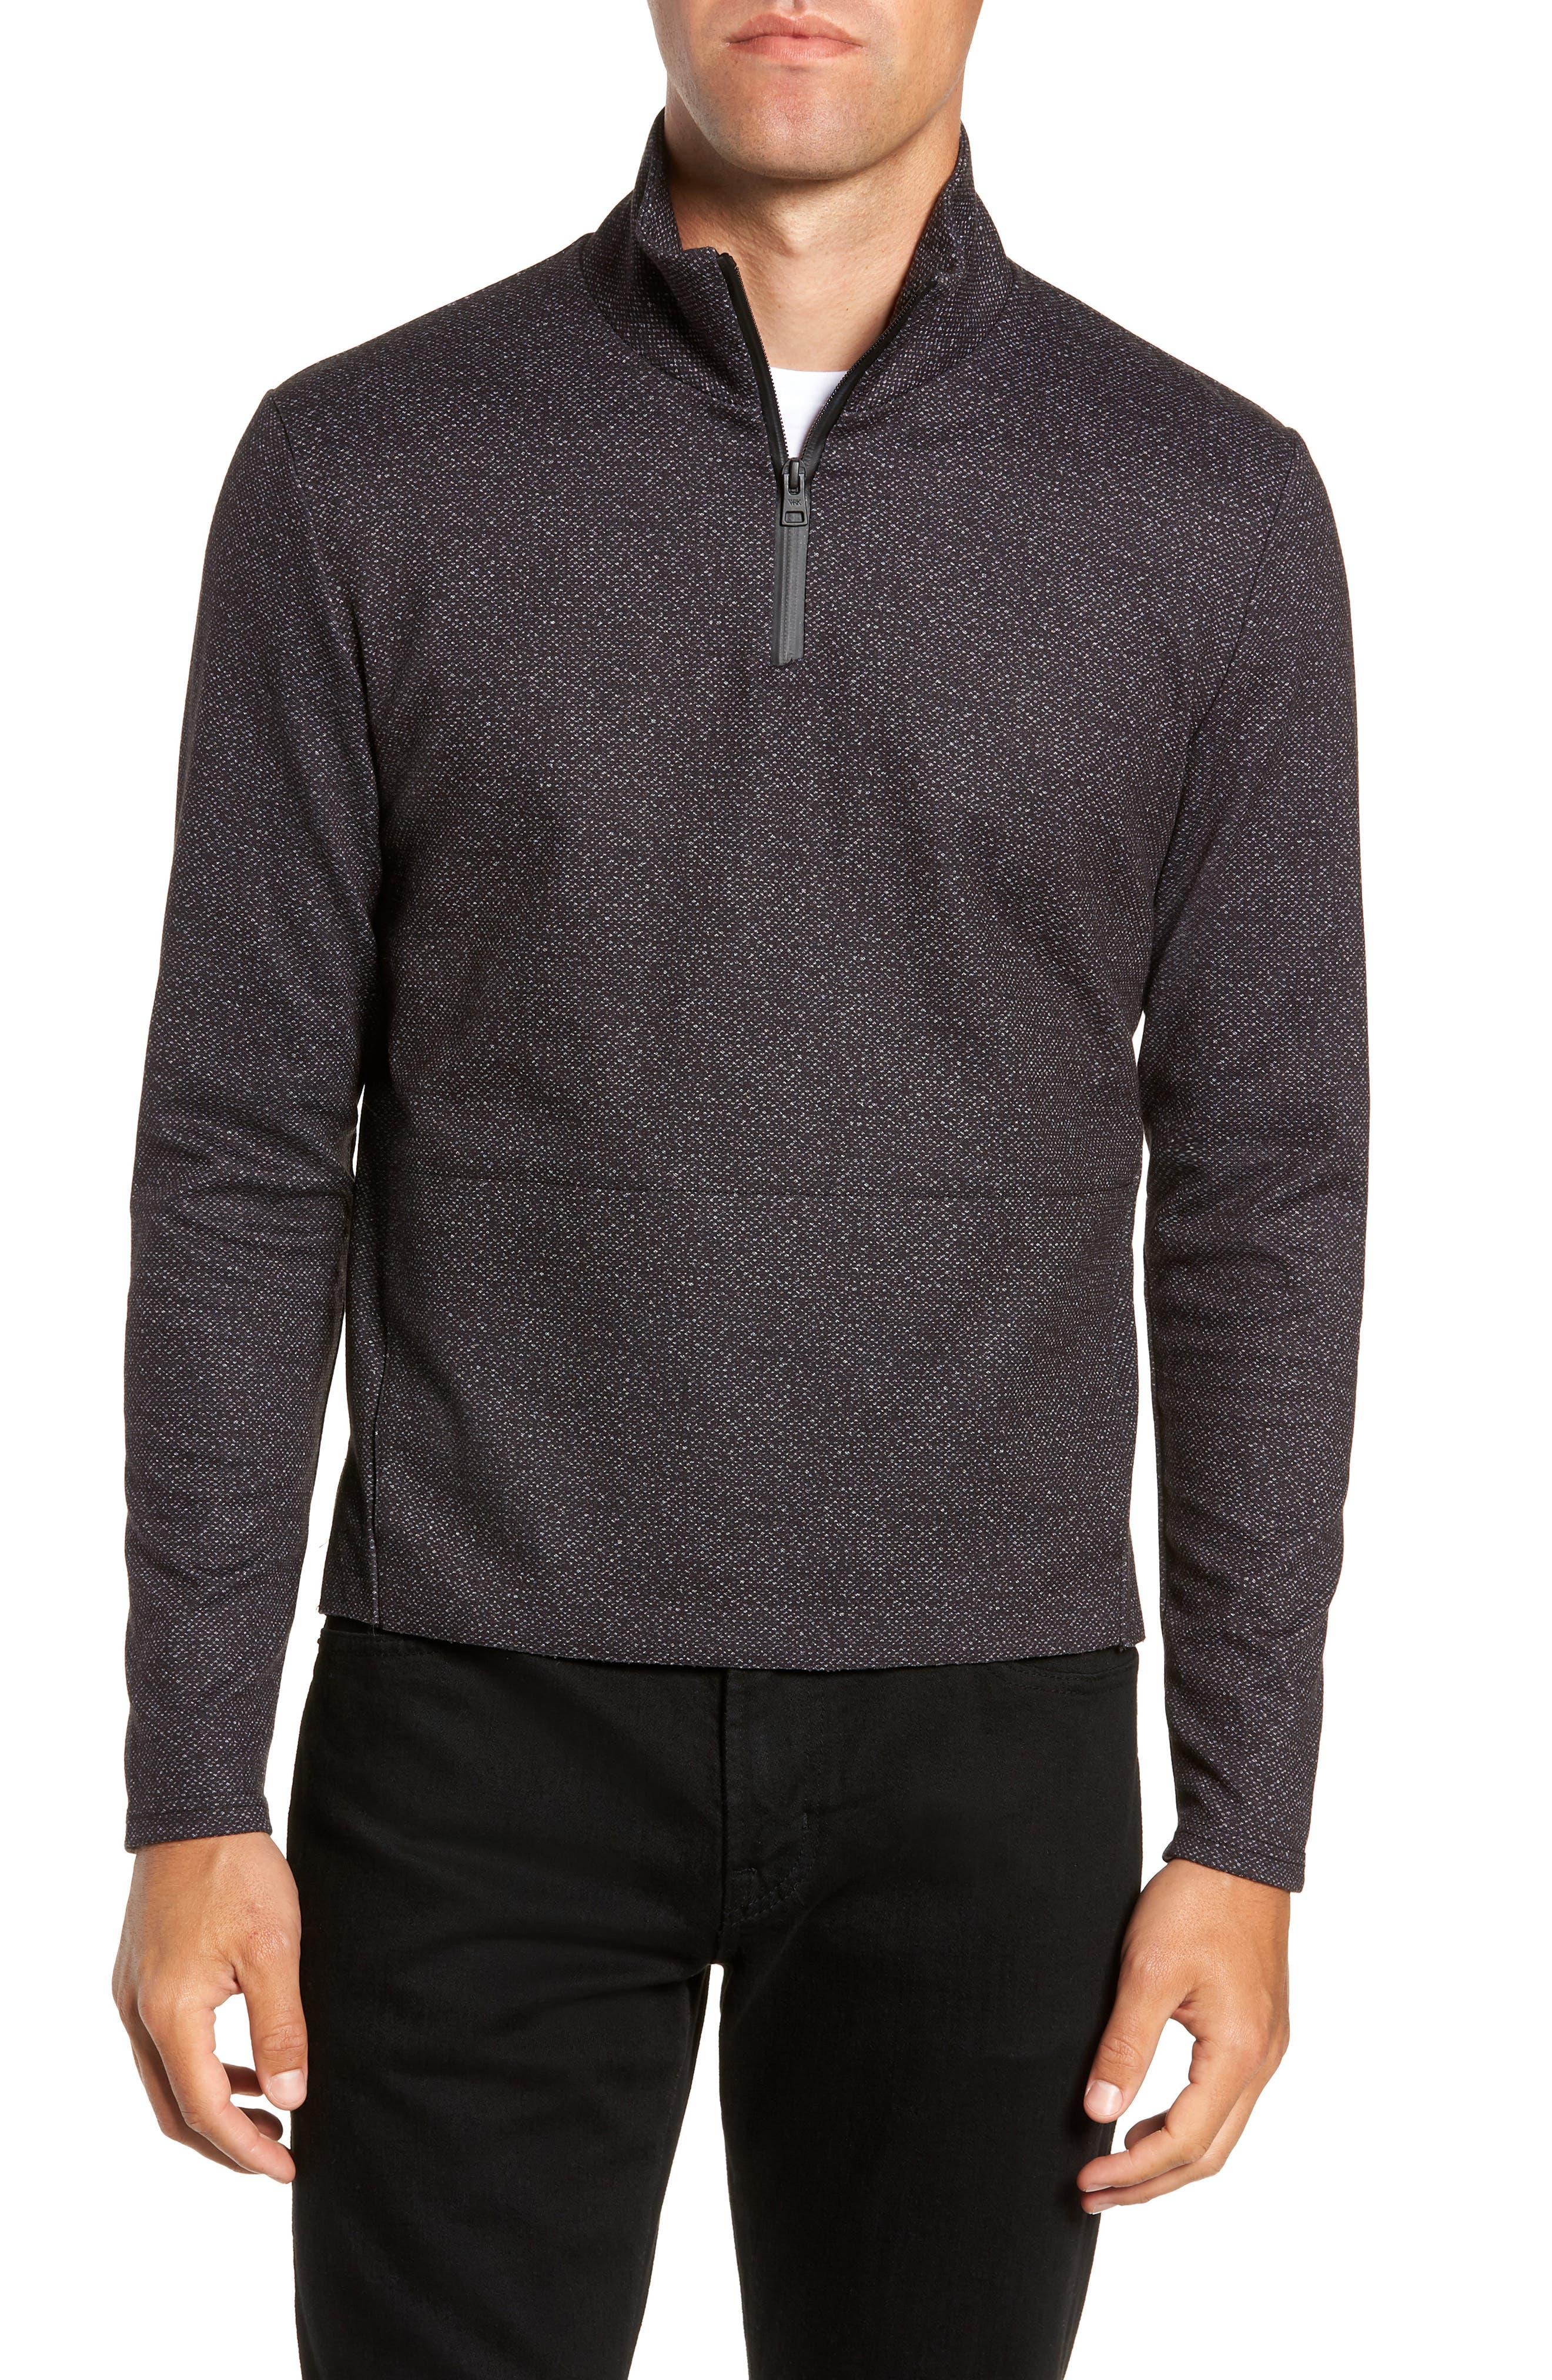 Oscar Quarter Zip Slim Fit Sweater,                             Main thumbnail 1, color,                             CHARCOAL